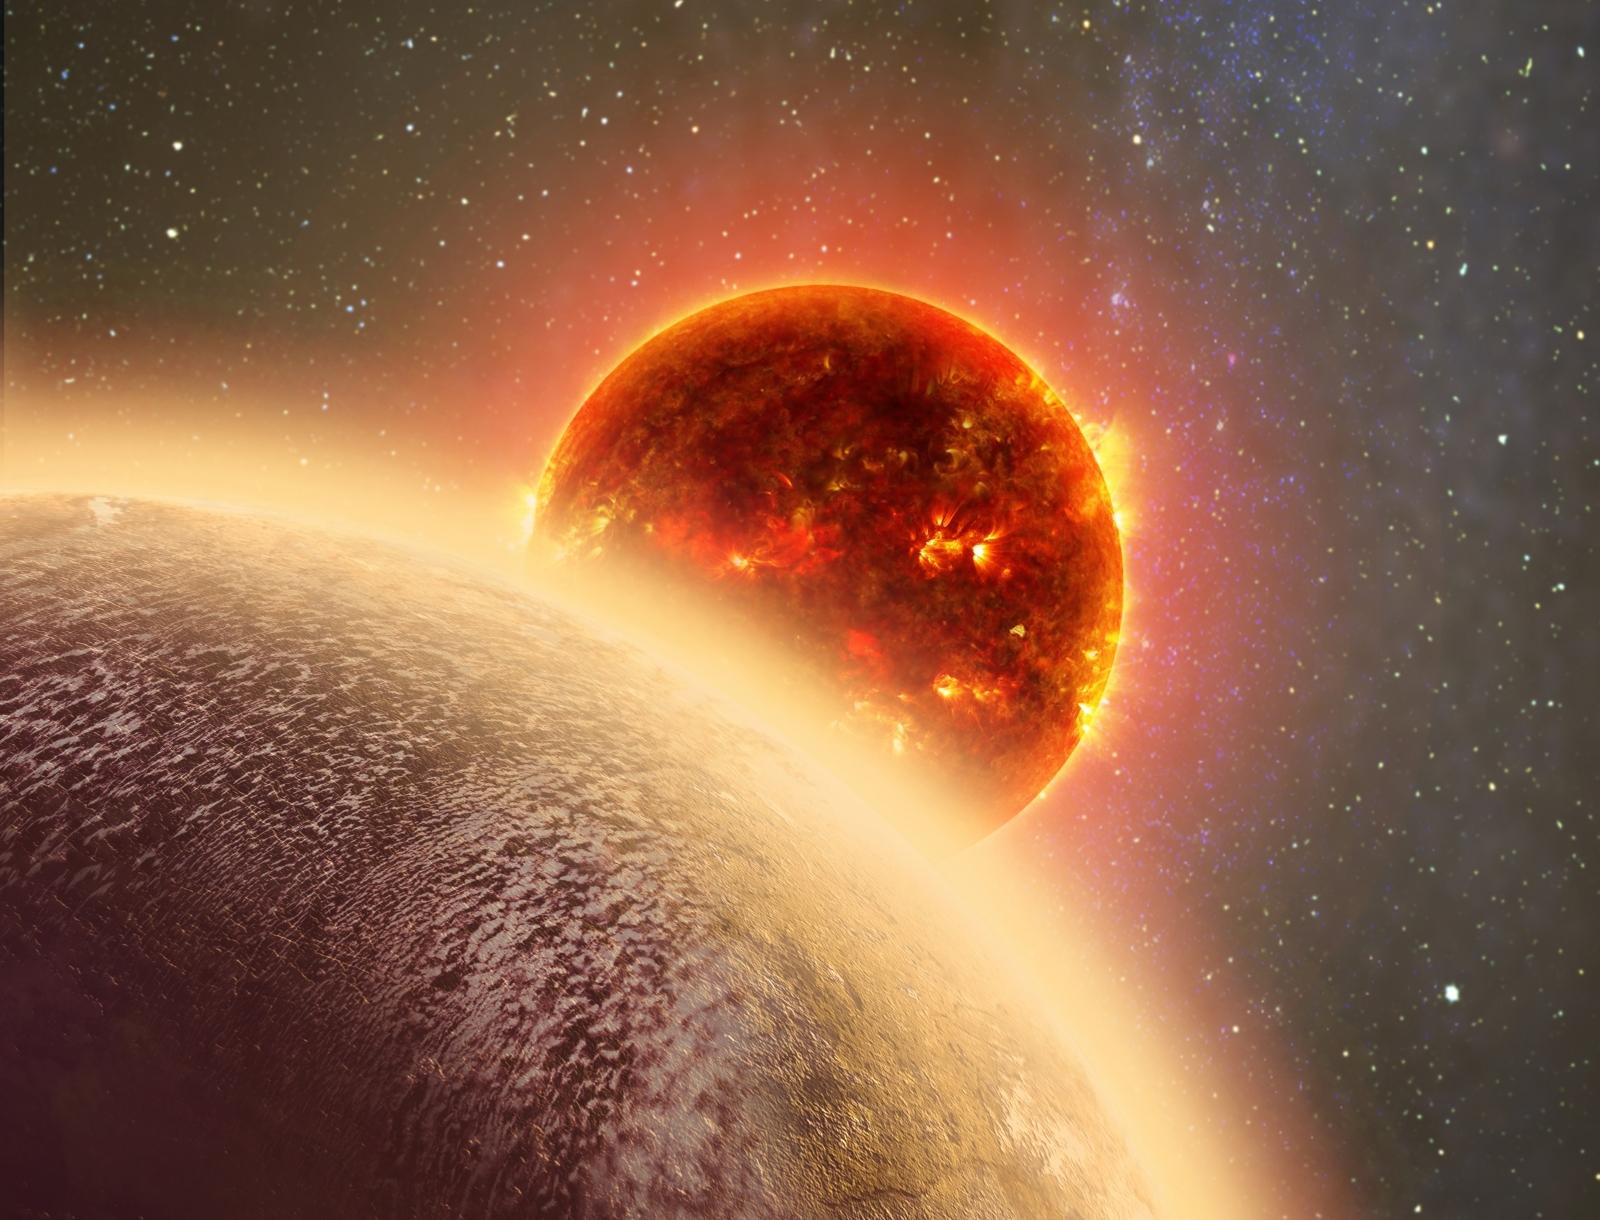 Venus-like exoplanet